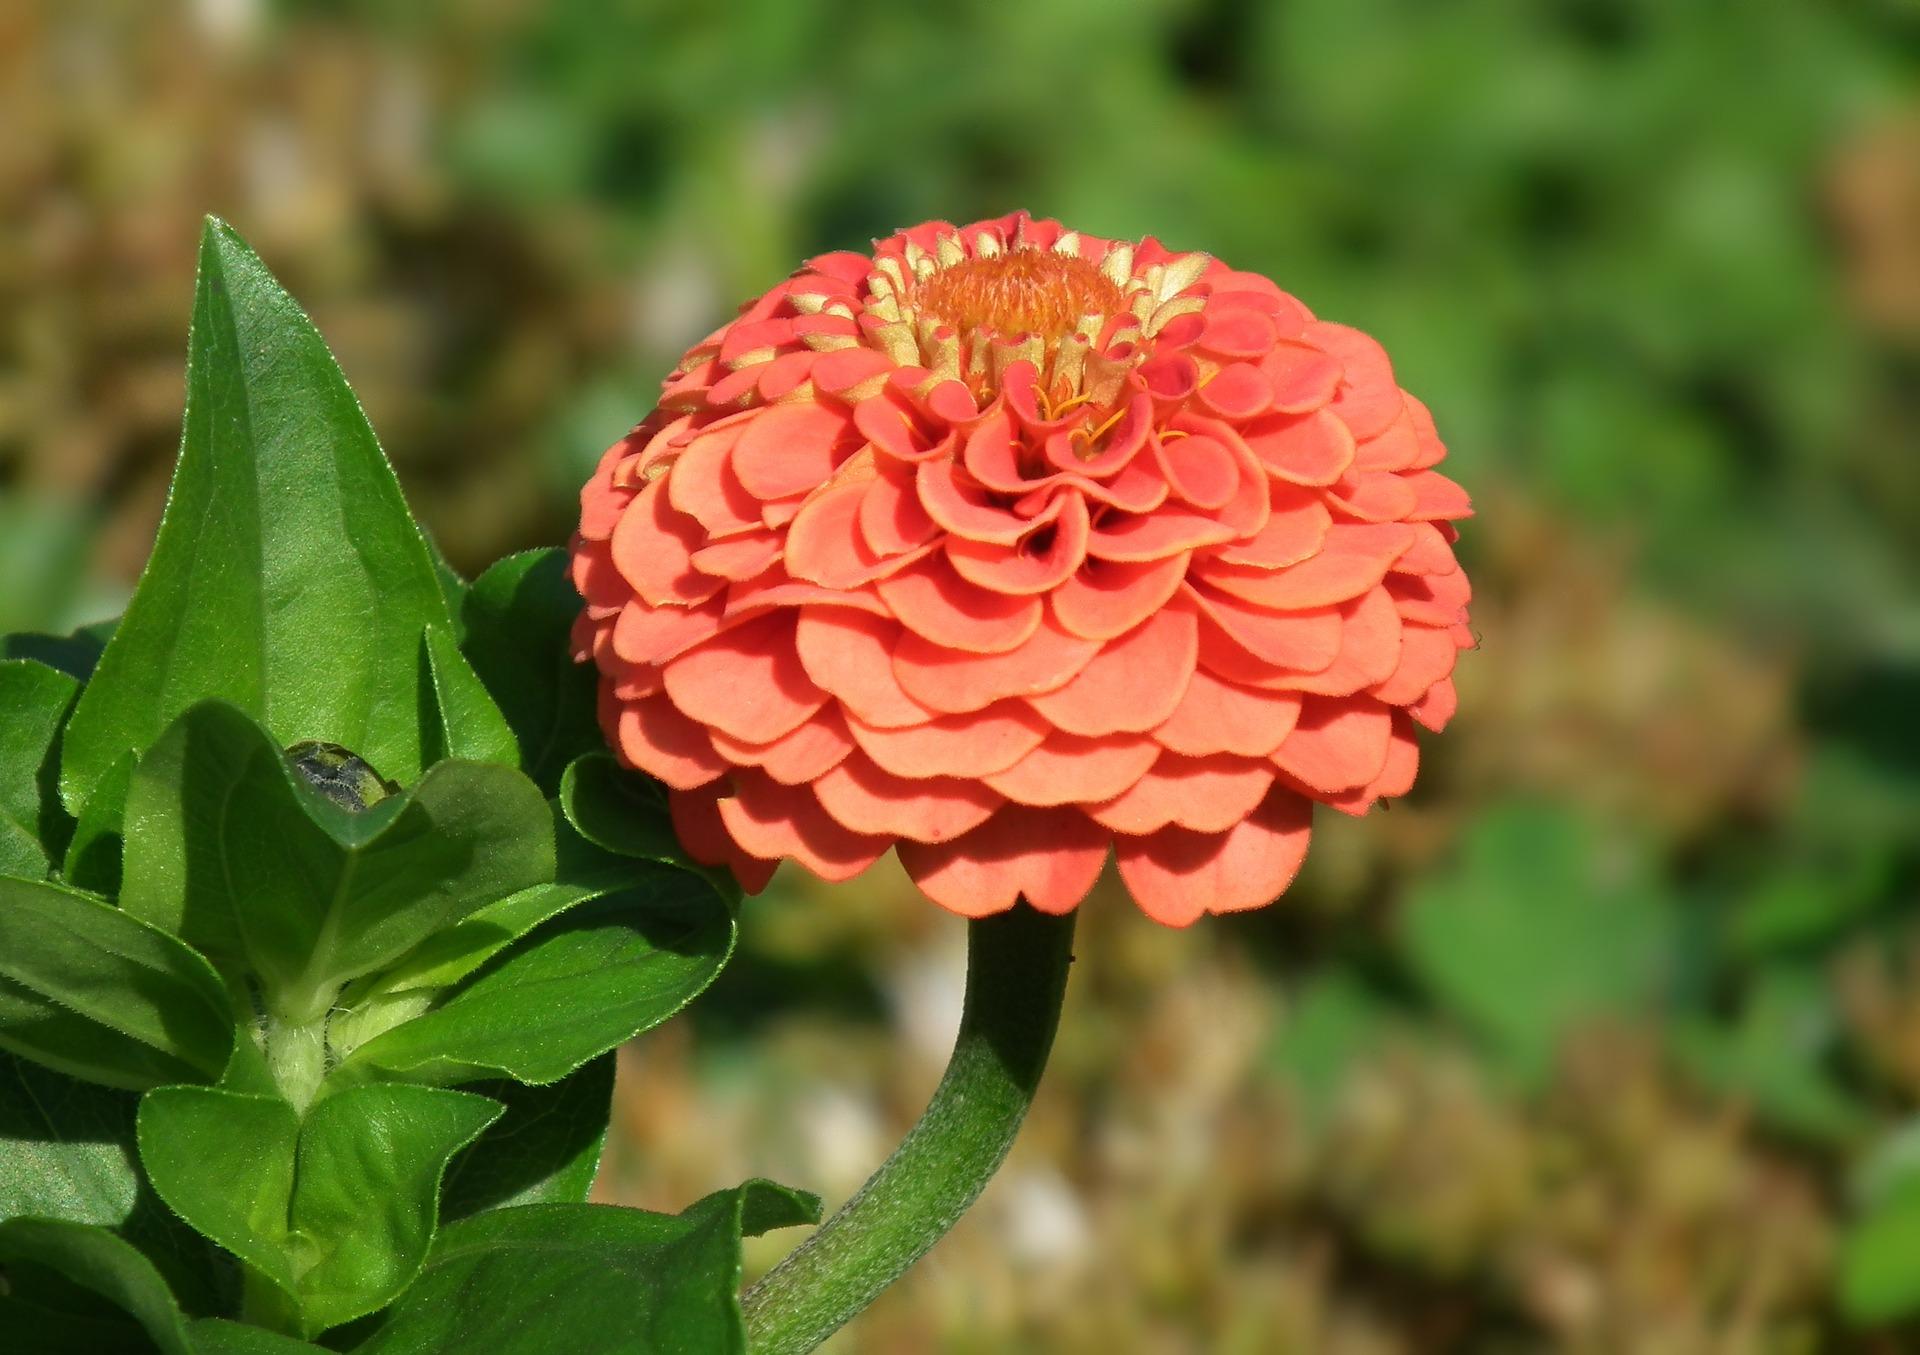 zinnia - top 10 flowers that attract butterflies and hummingbirds